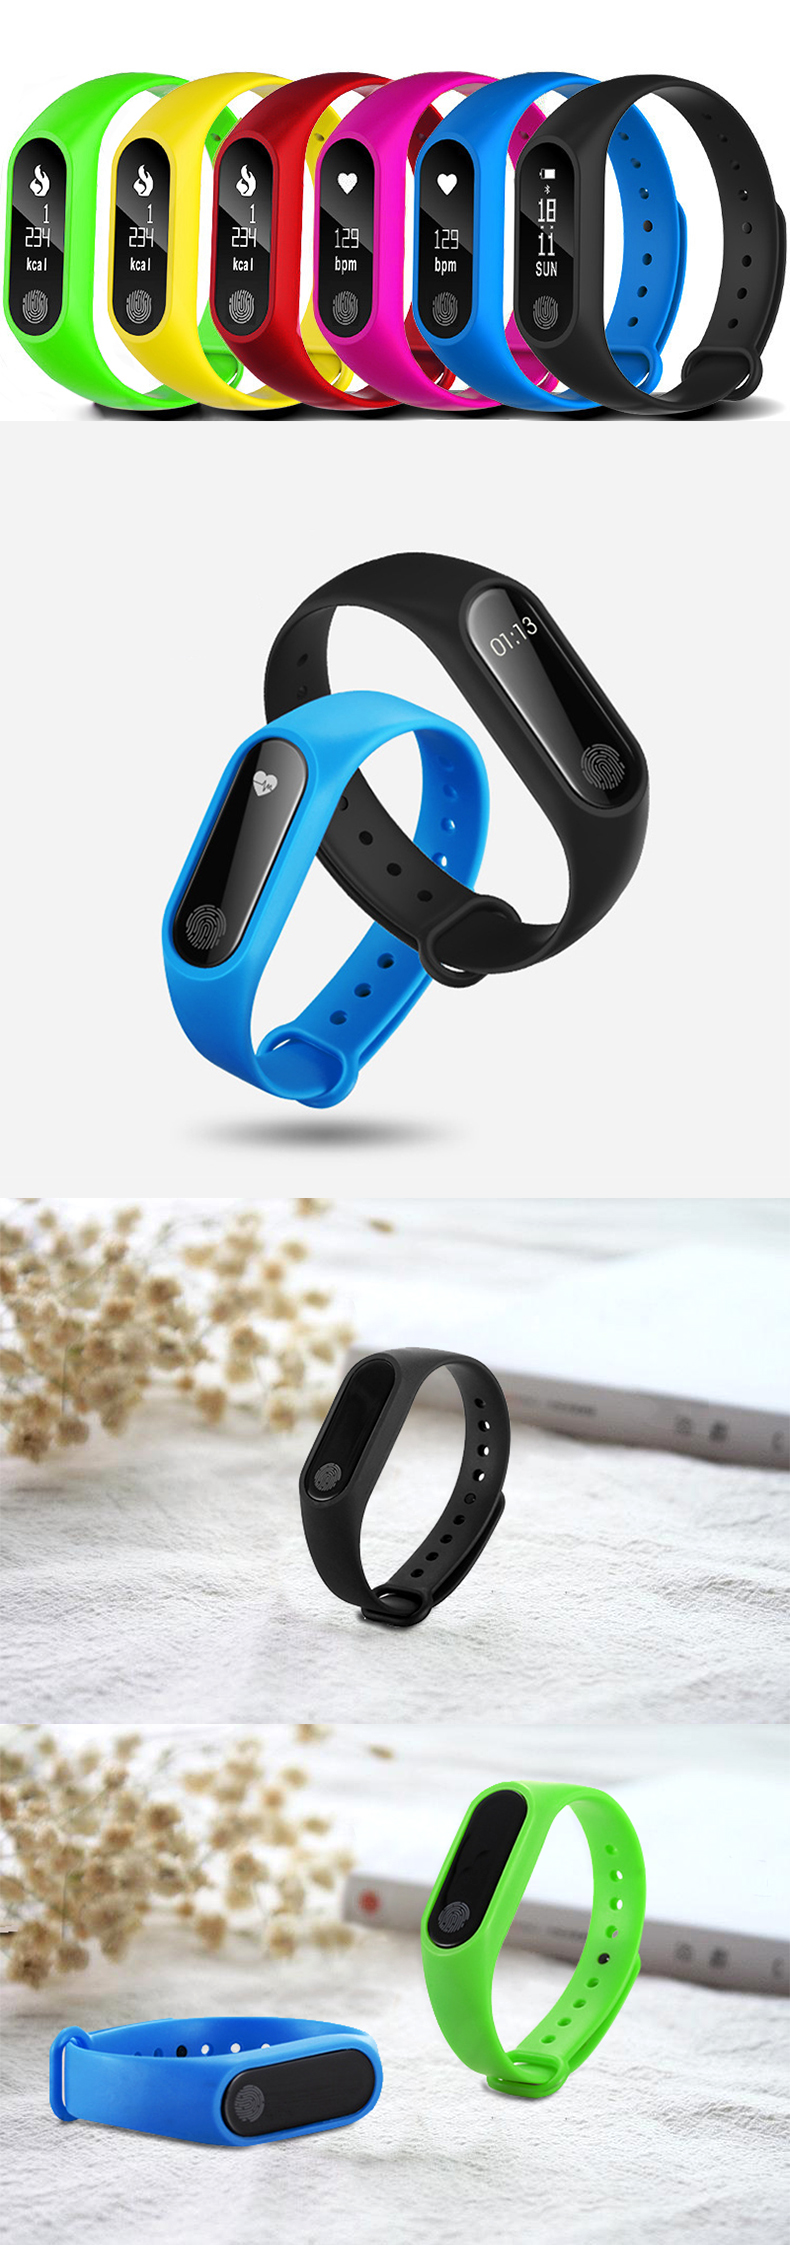 HTB1UVAce.GF3KVjSZFmq6zqPXXaI M2 Sport Bracelet Smart Band Heart Rate Watch Men Women Smartwatch For Android IOS Fitness Tracker Electronics Smart Clock